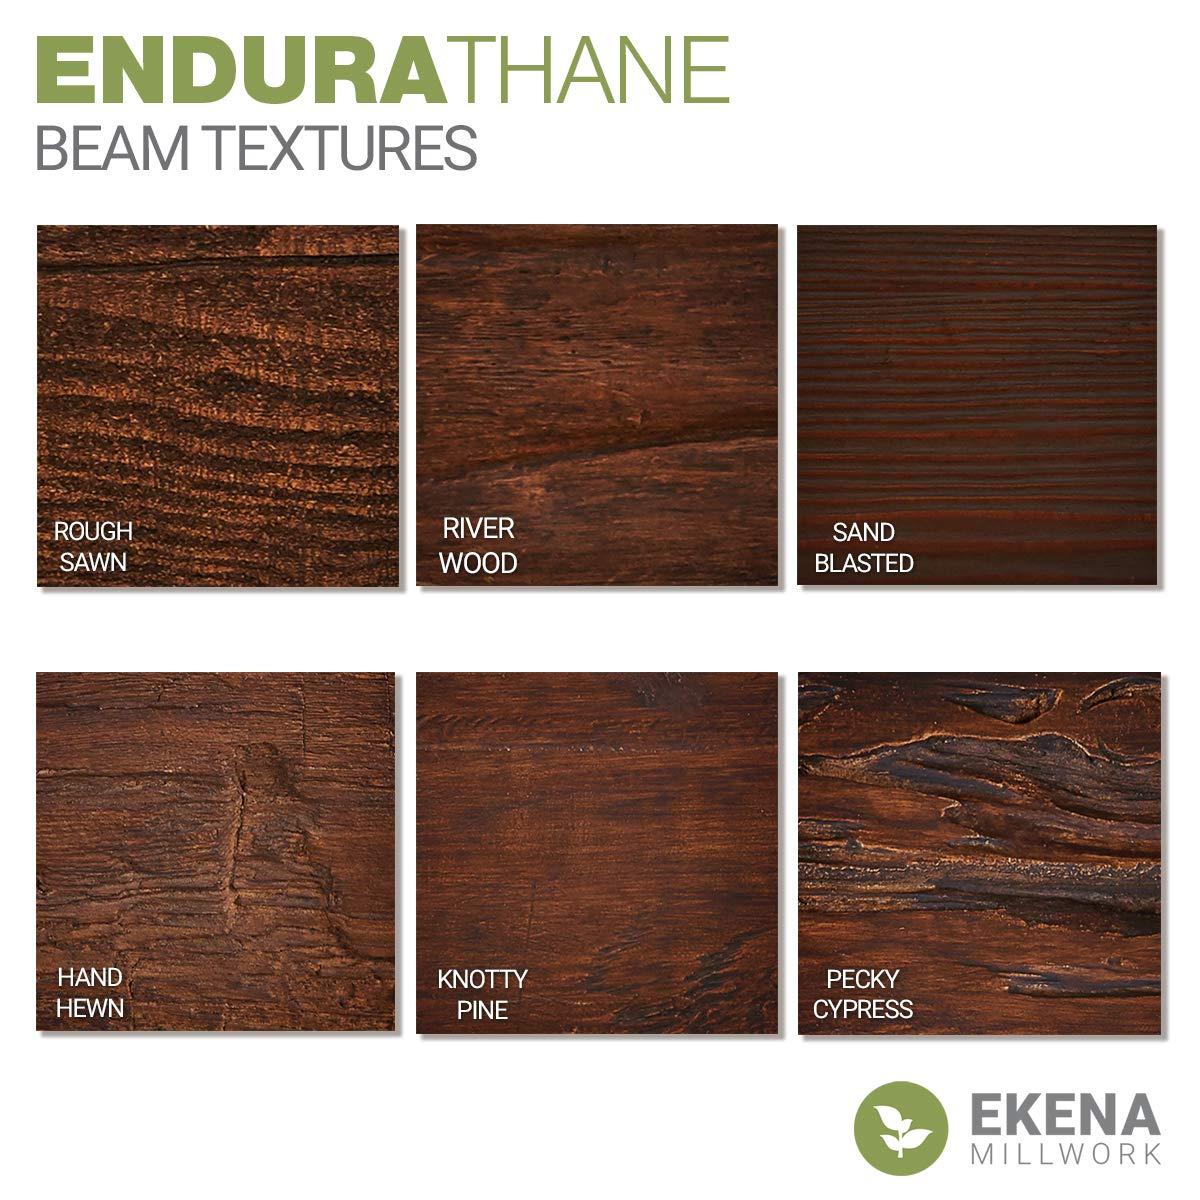 Ekena Millwork BMRW3C0040X060X120PP 3-Sided U-Beam Puritan Pine Riverwood Faux Wood Beam 4W x 6H x 10L